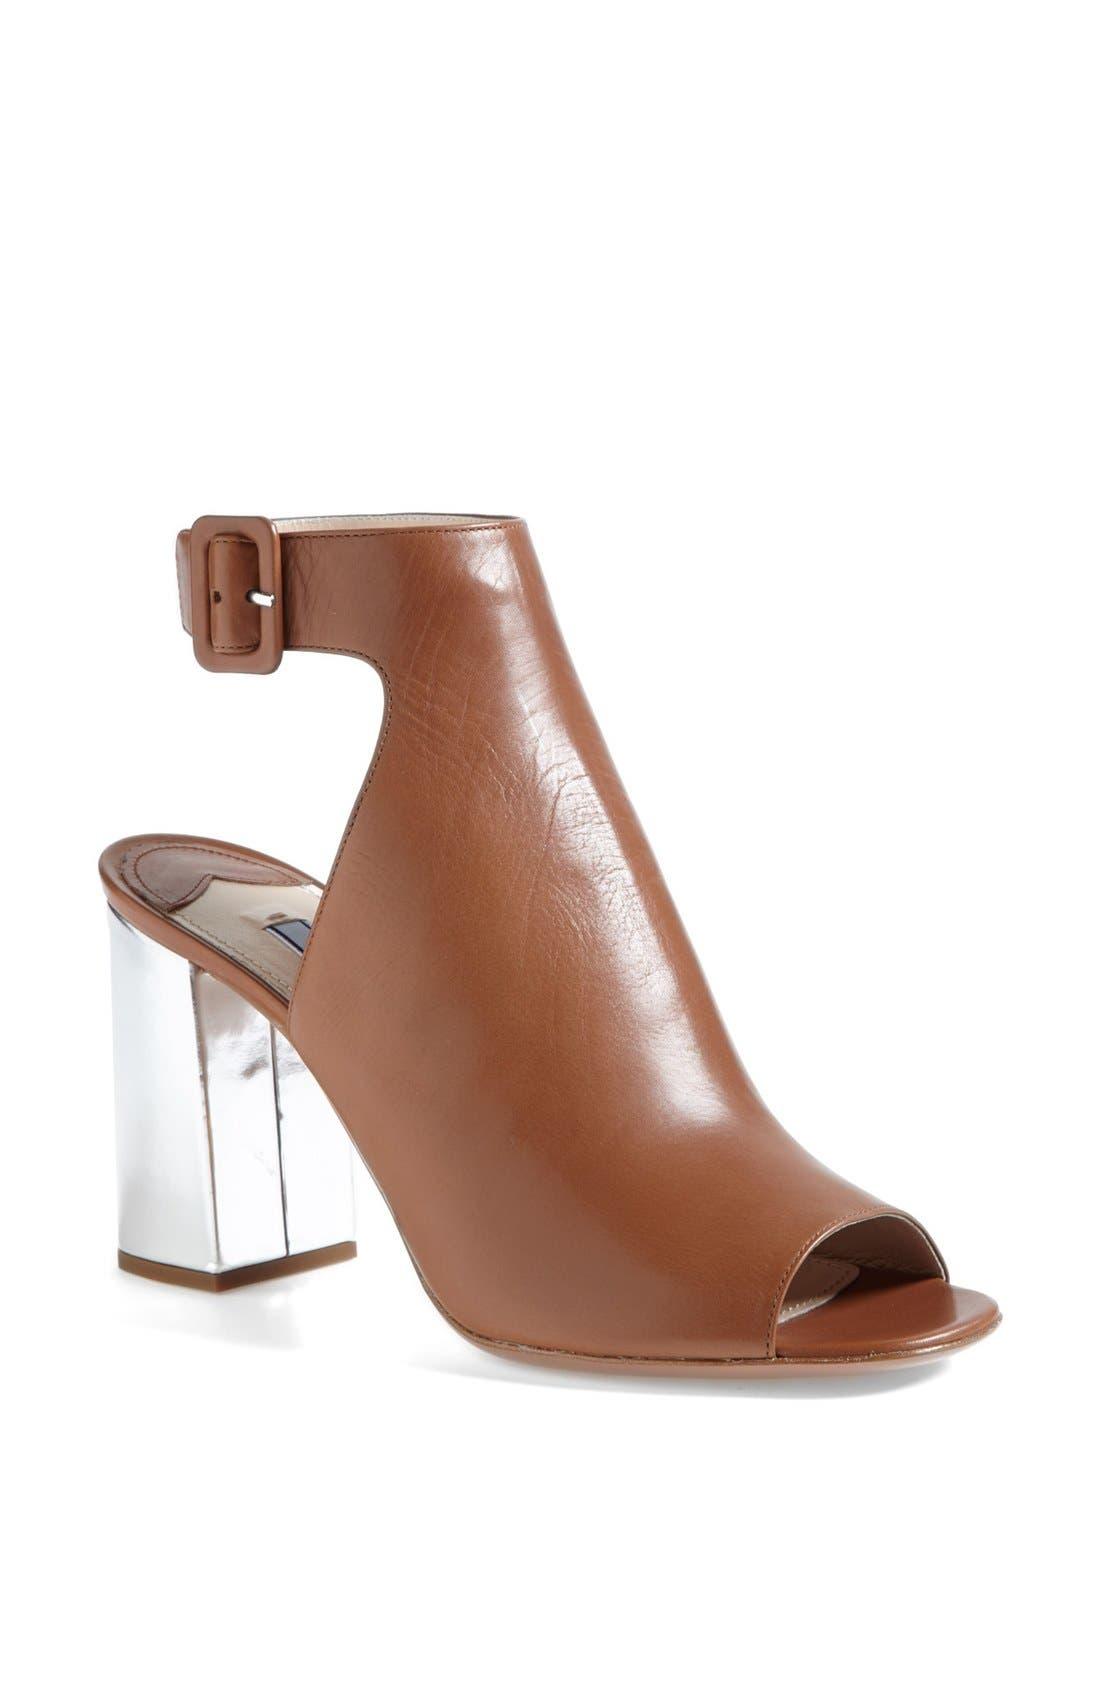 Alternate Image 1 Selected - Prada Glove Slingback Sandal (Women)